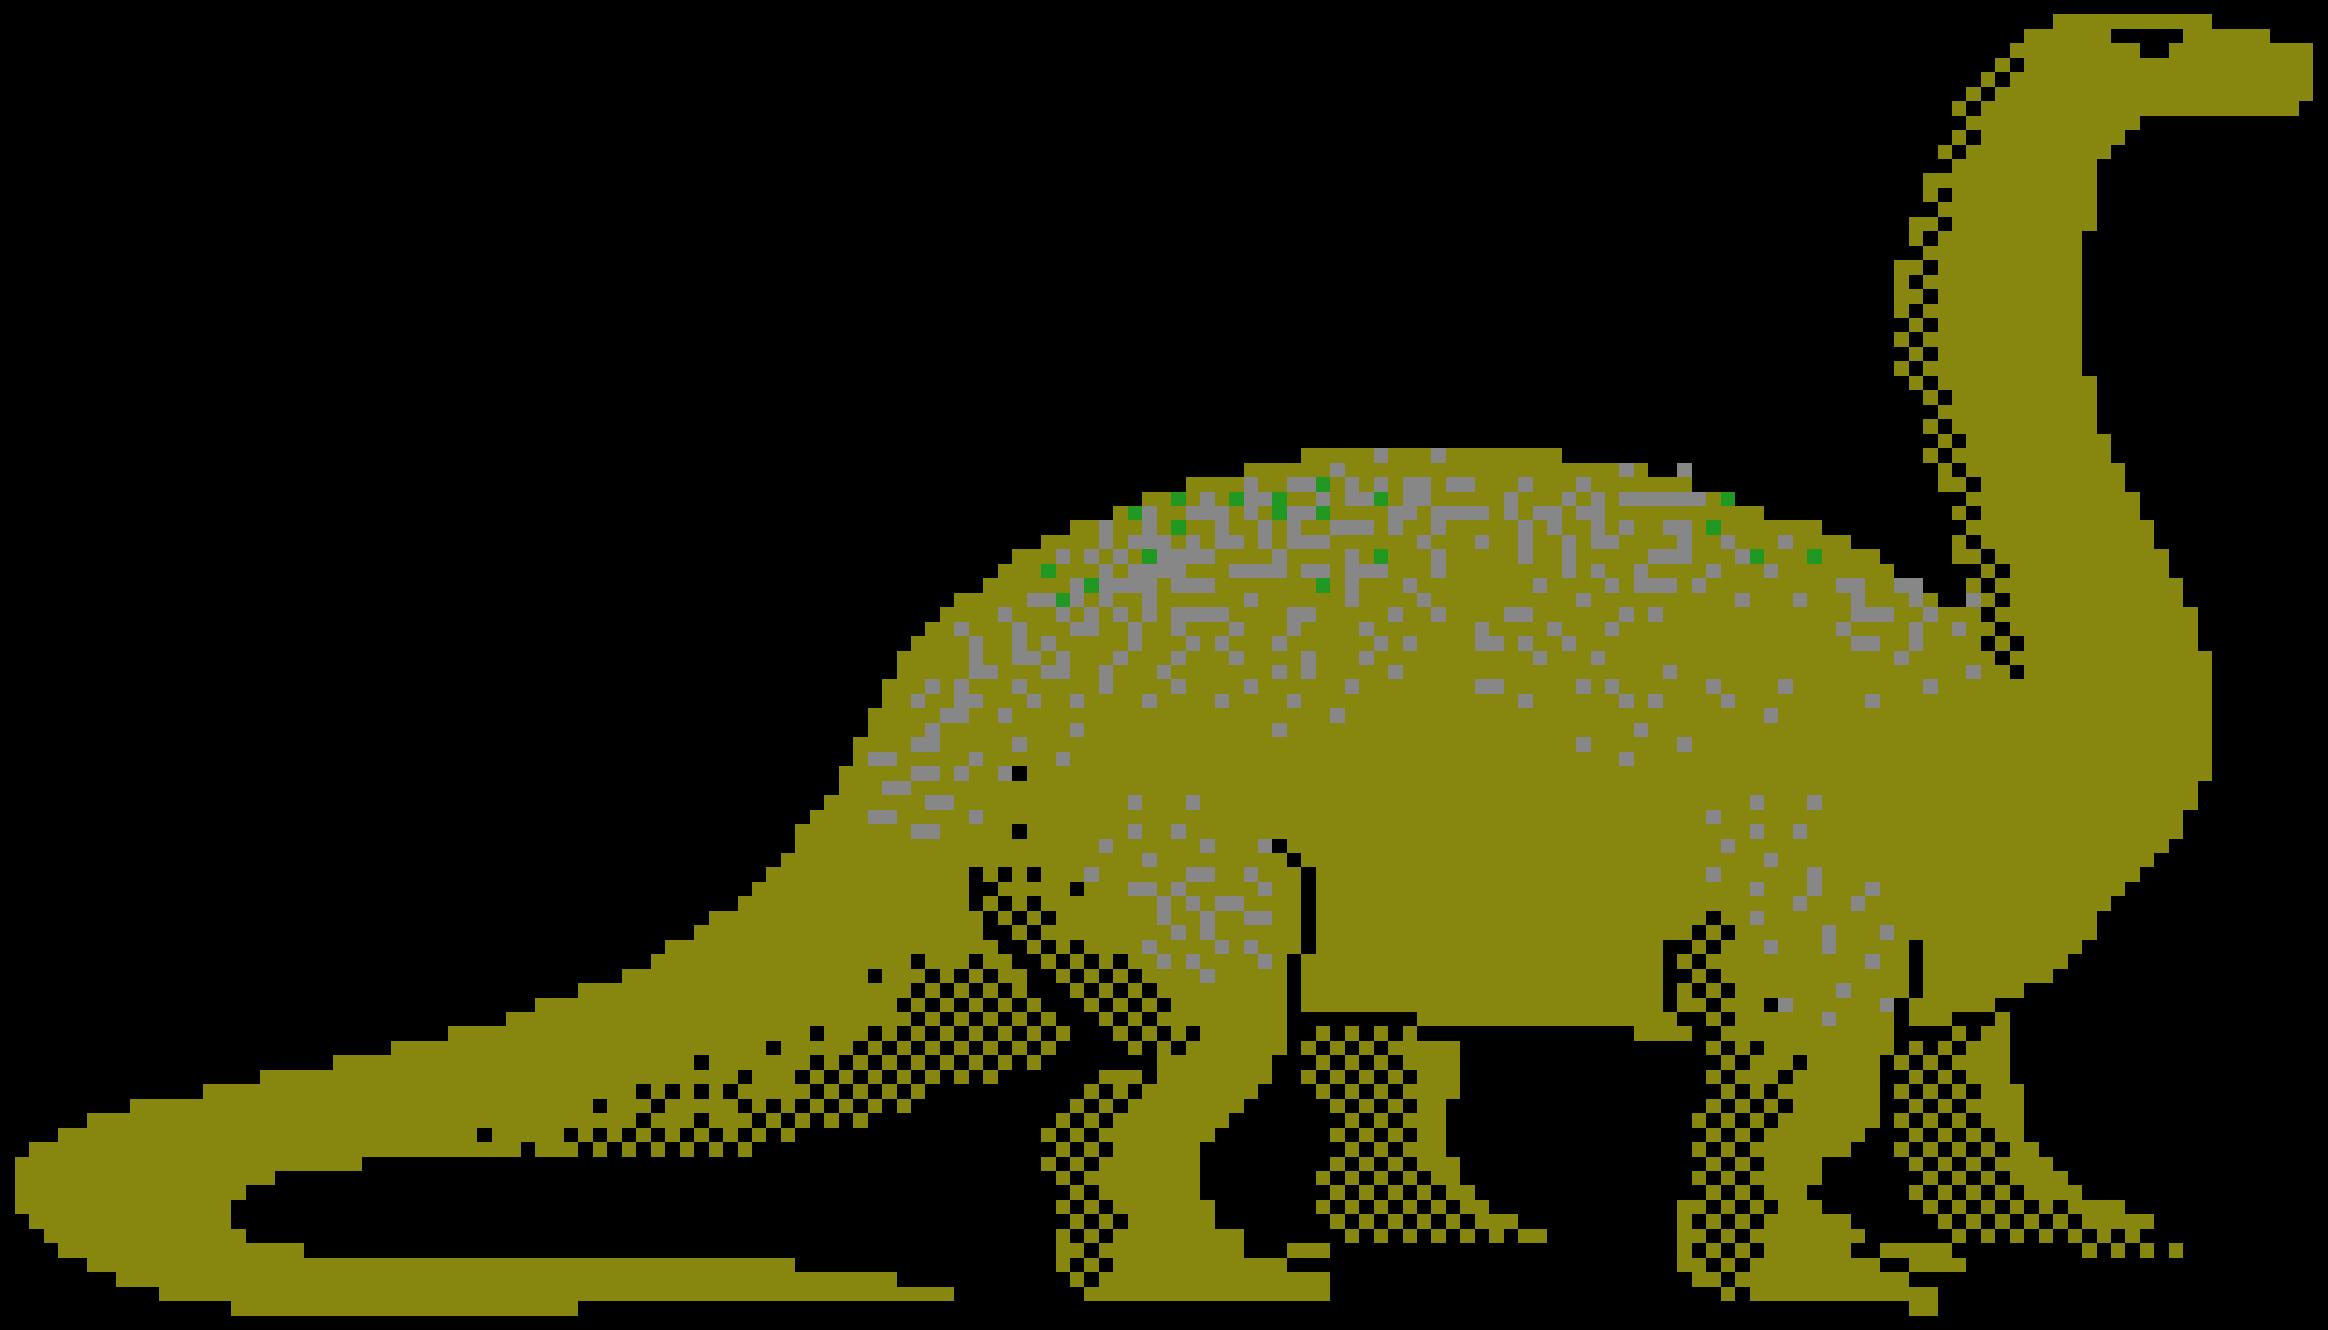 Beagle bros big image. Clipart dinosaur simple